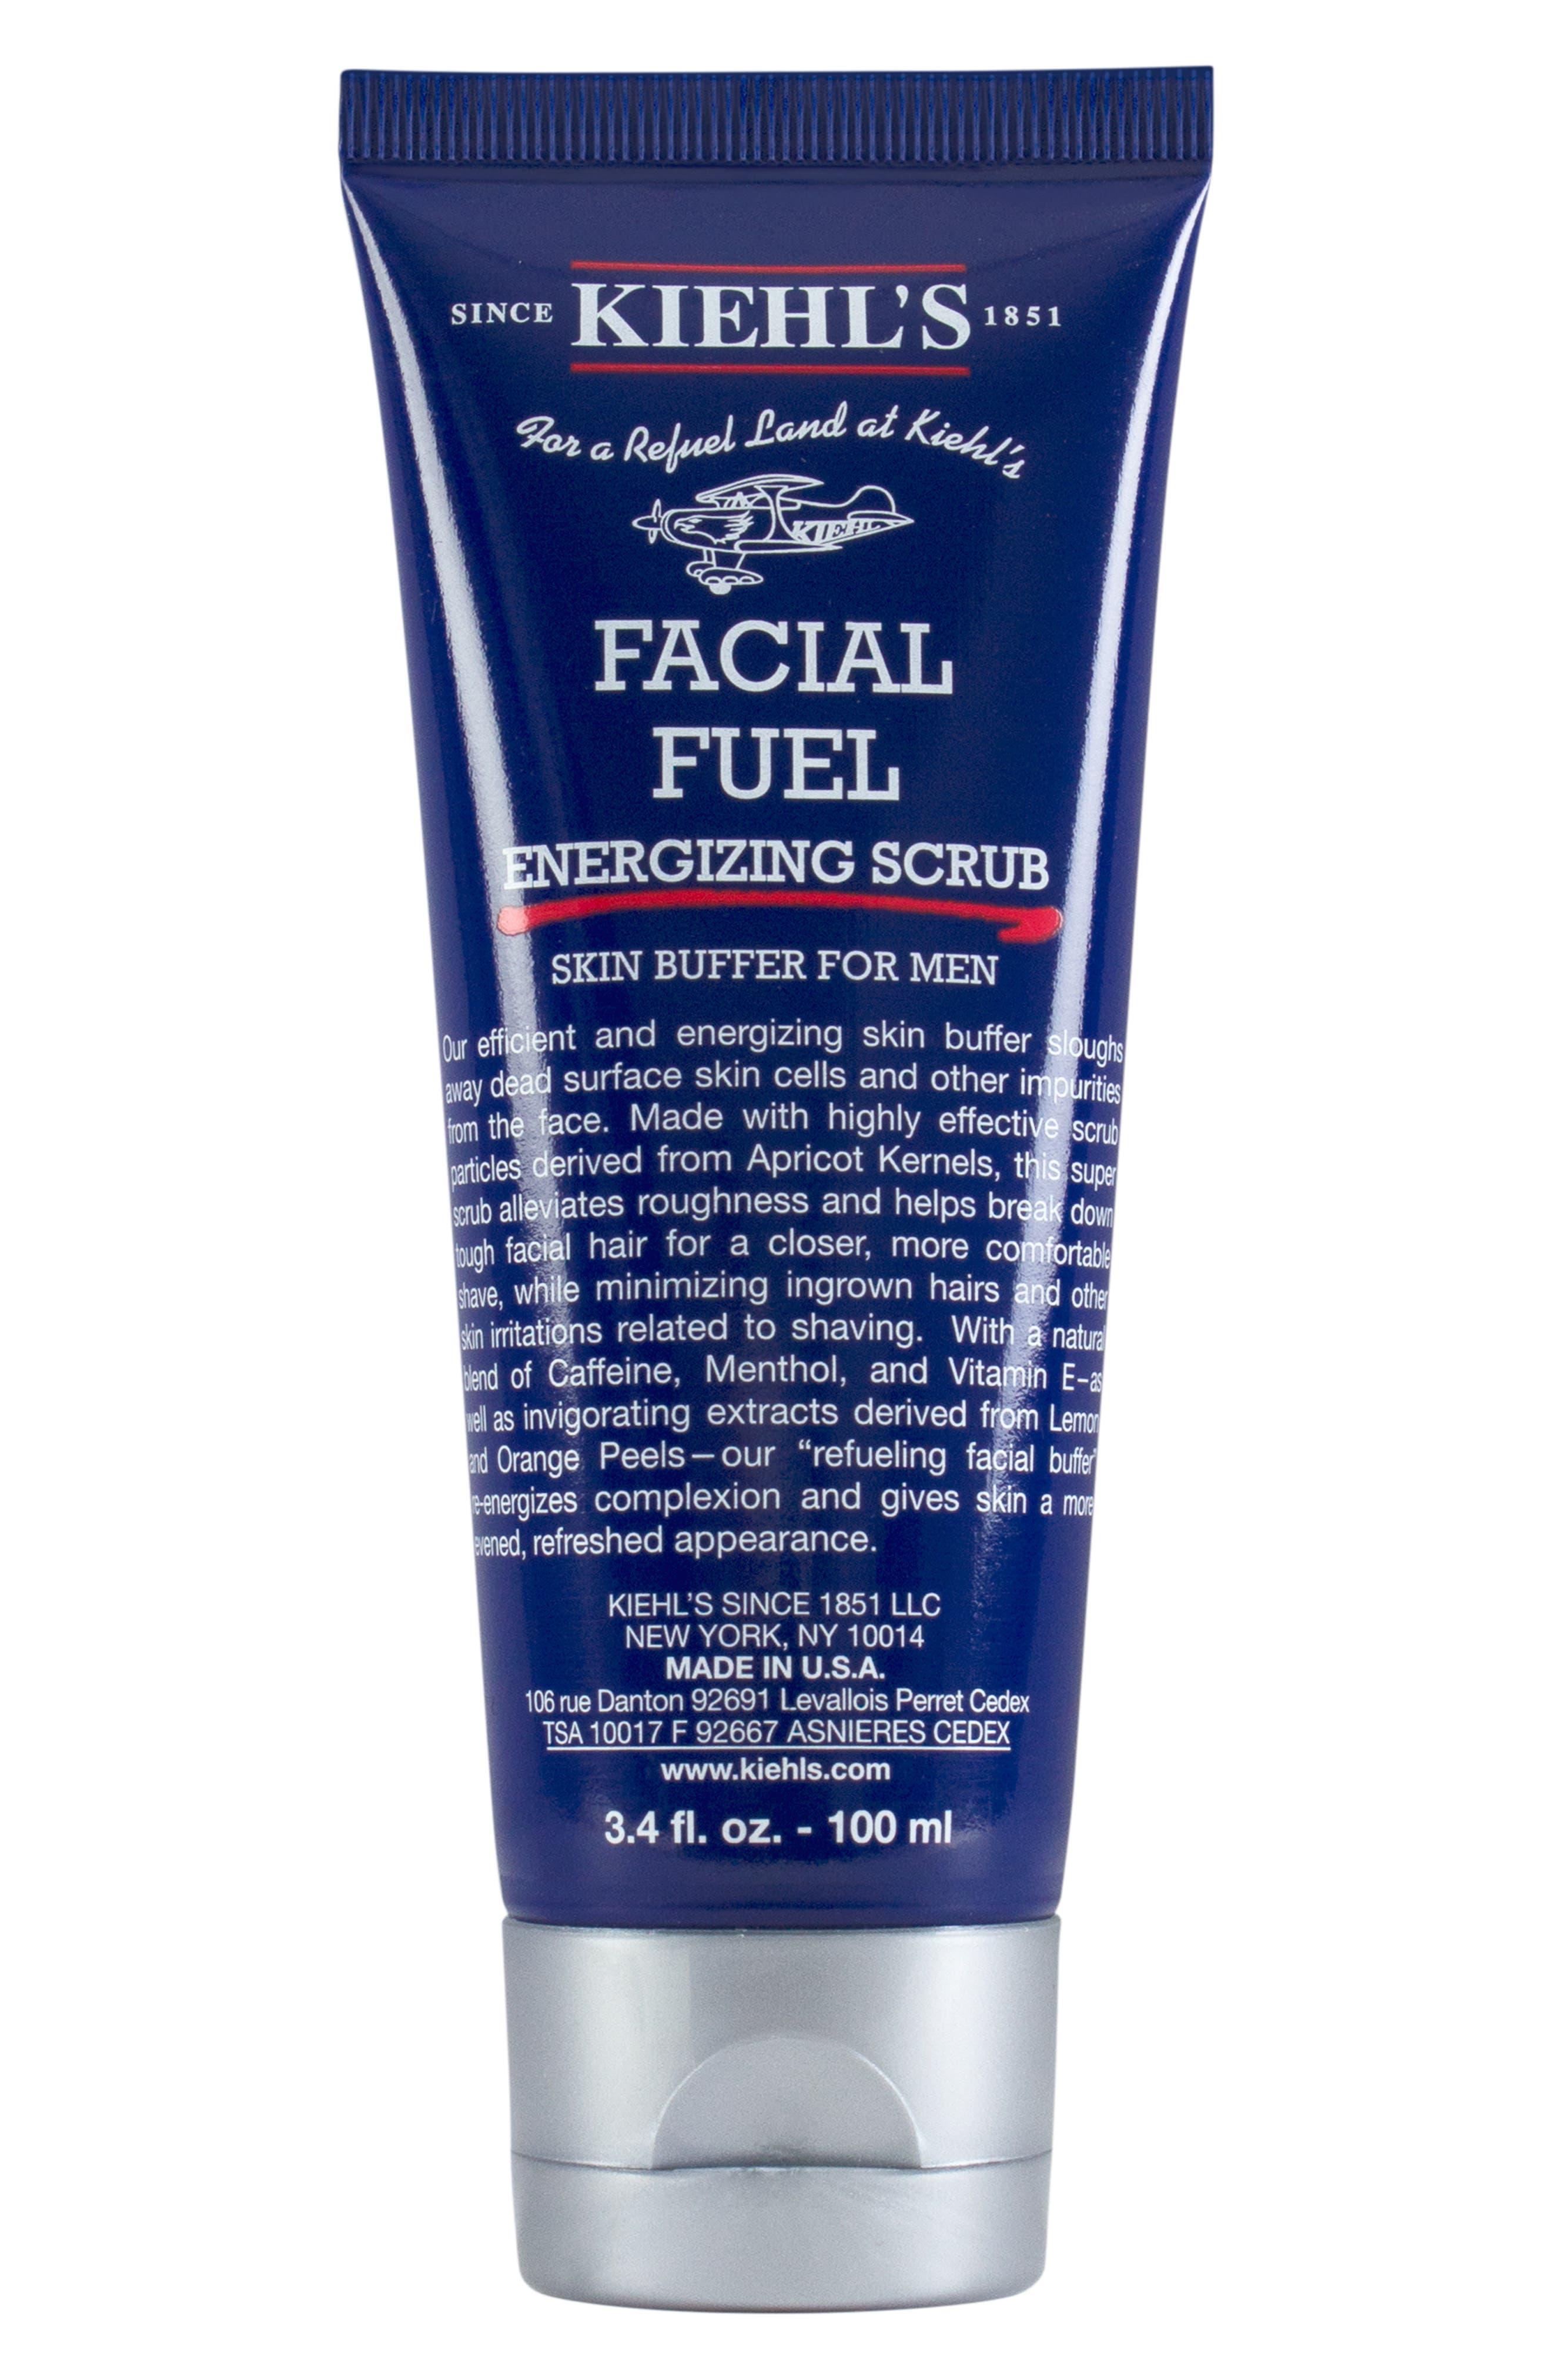 Main Image - Kiehl's Since 1851 Facial Fuel Energizing Scrub